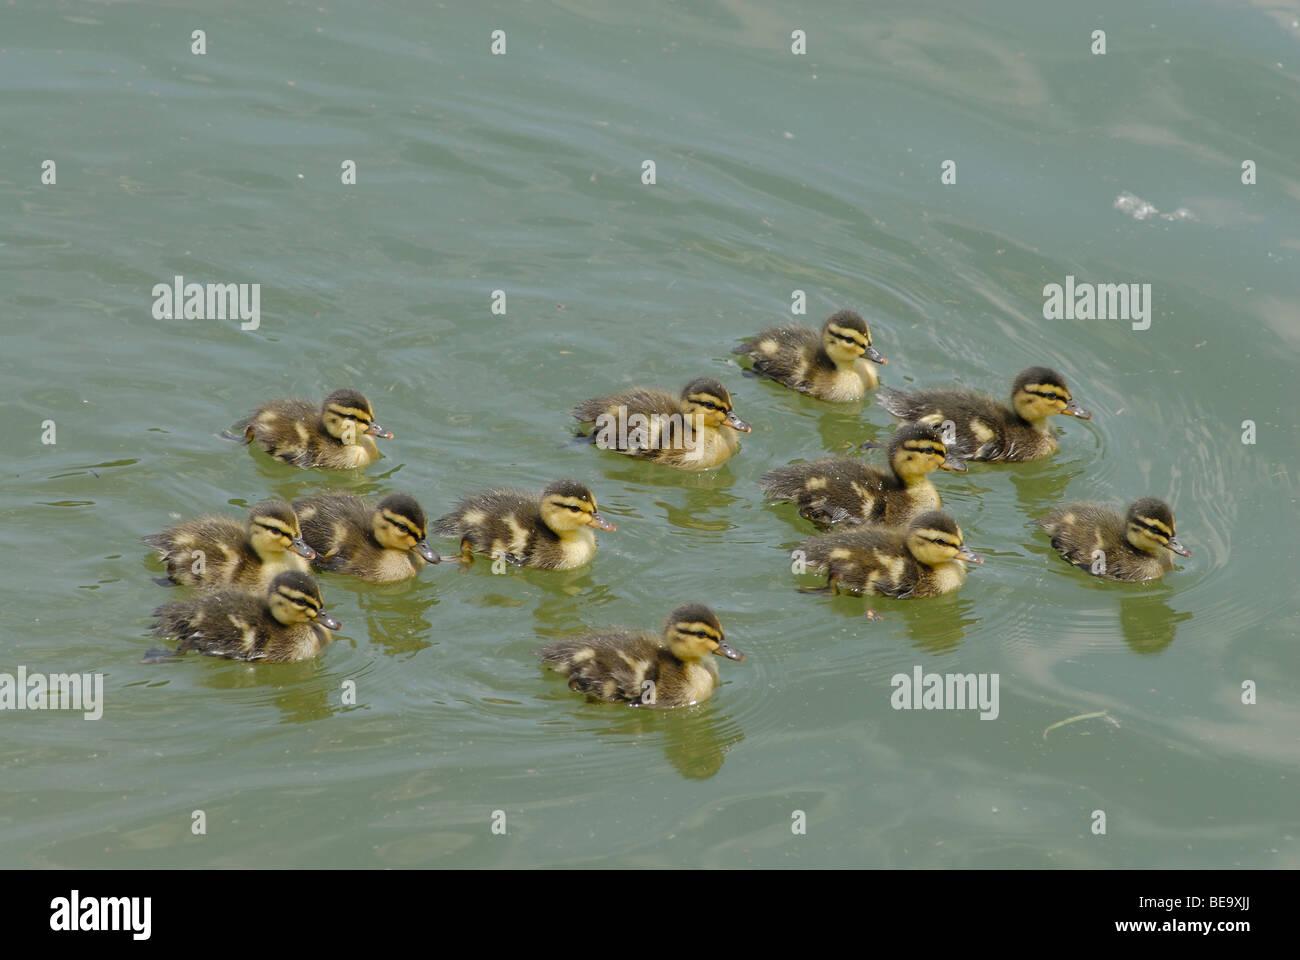 Mallard ducklings in a marsh in Plano, Texas, USA - Stock Image